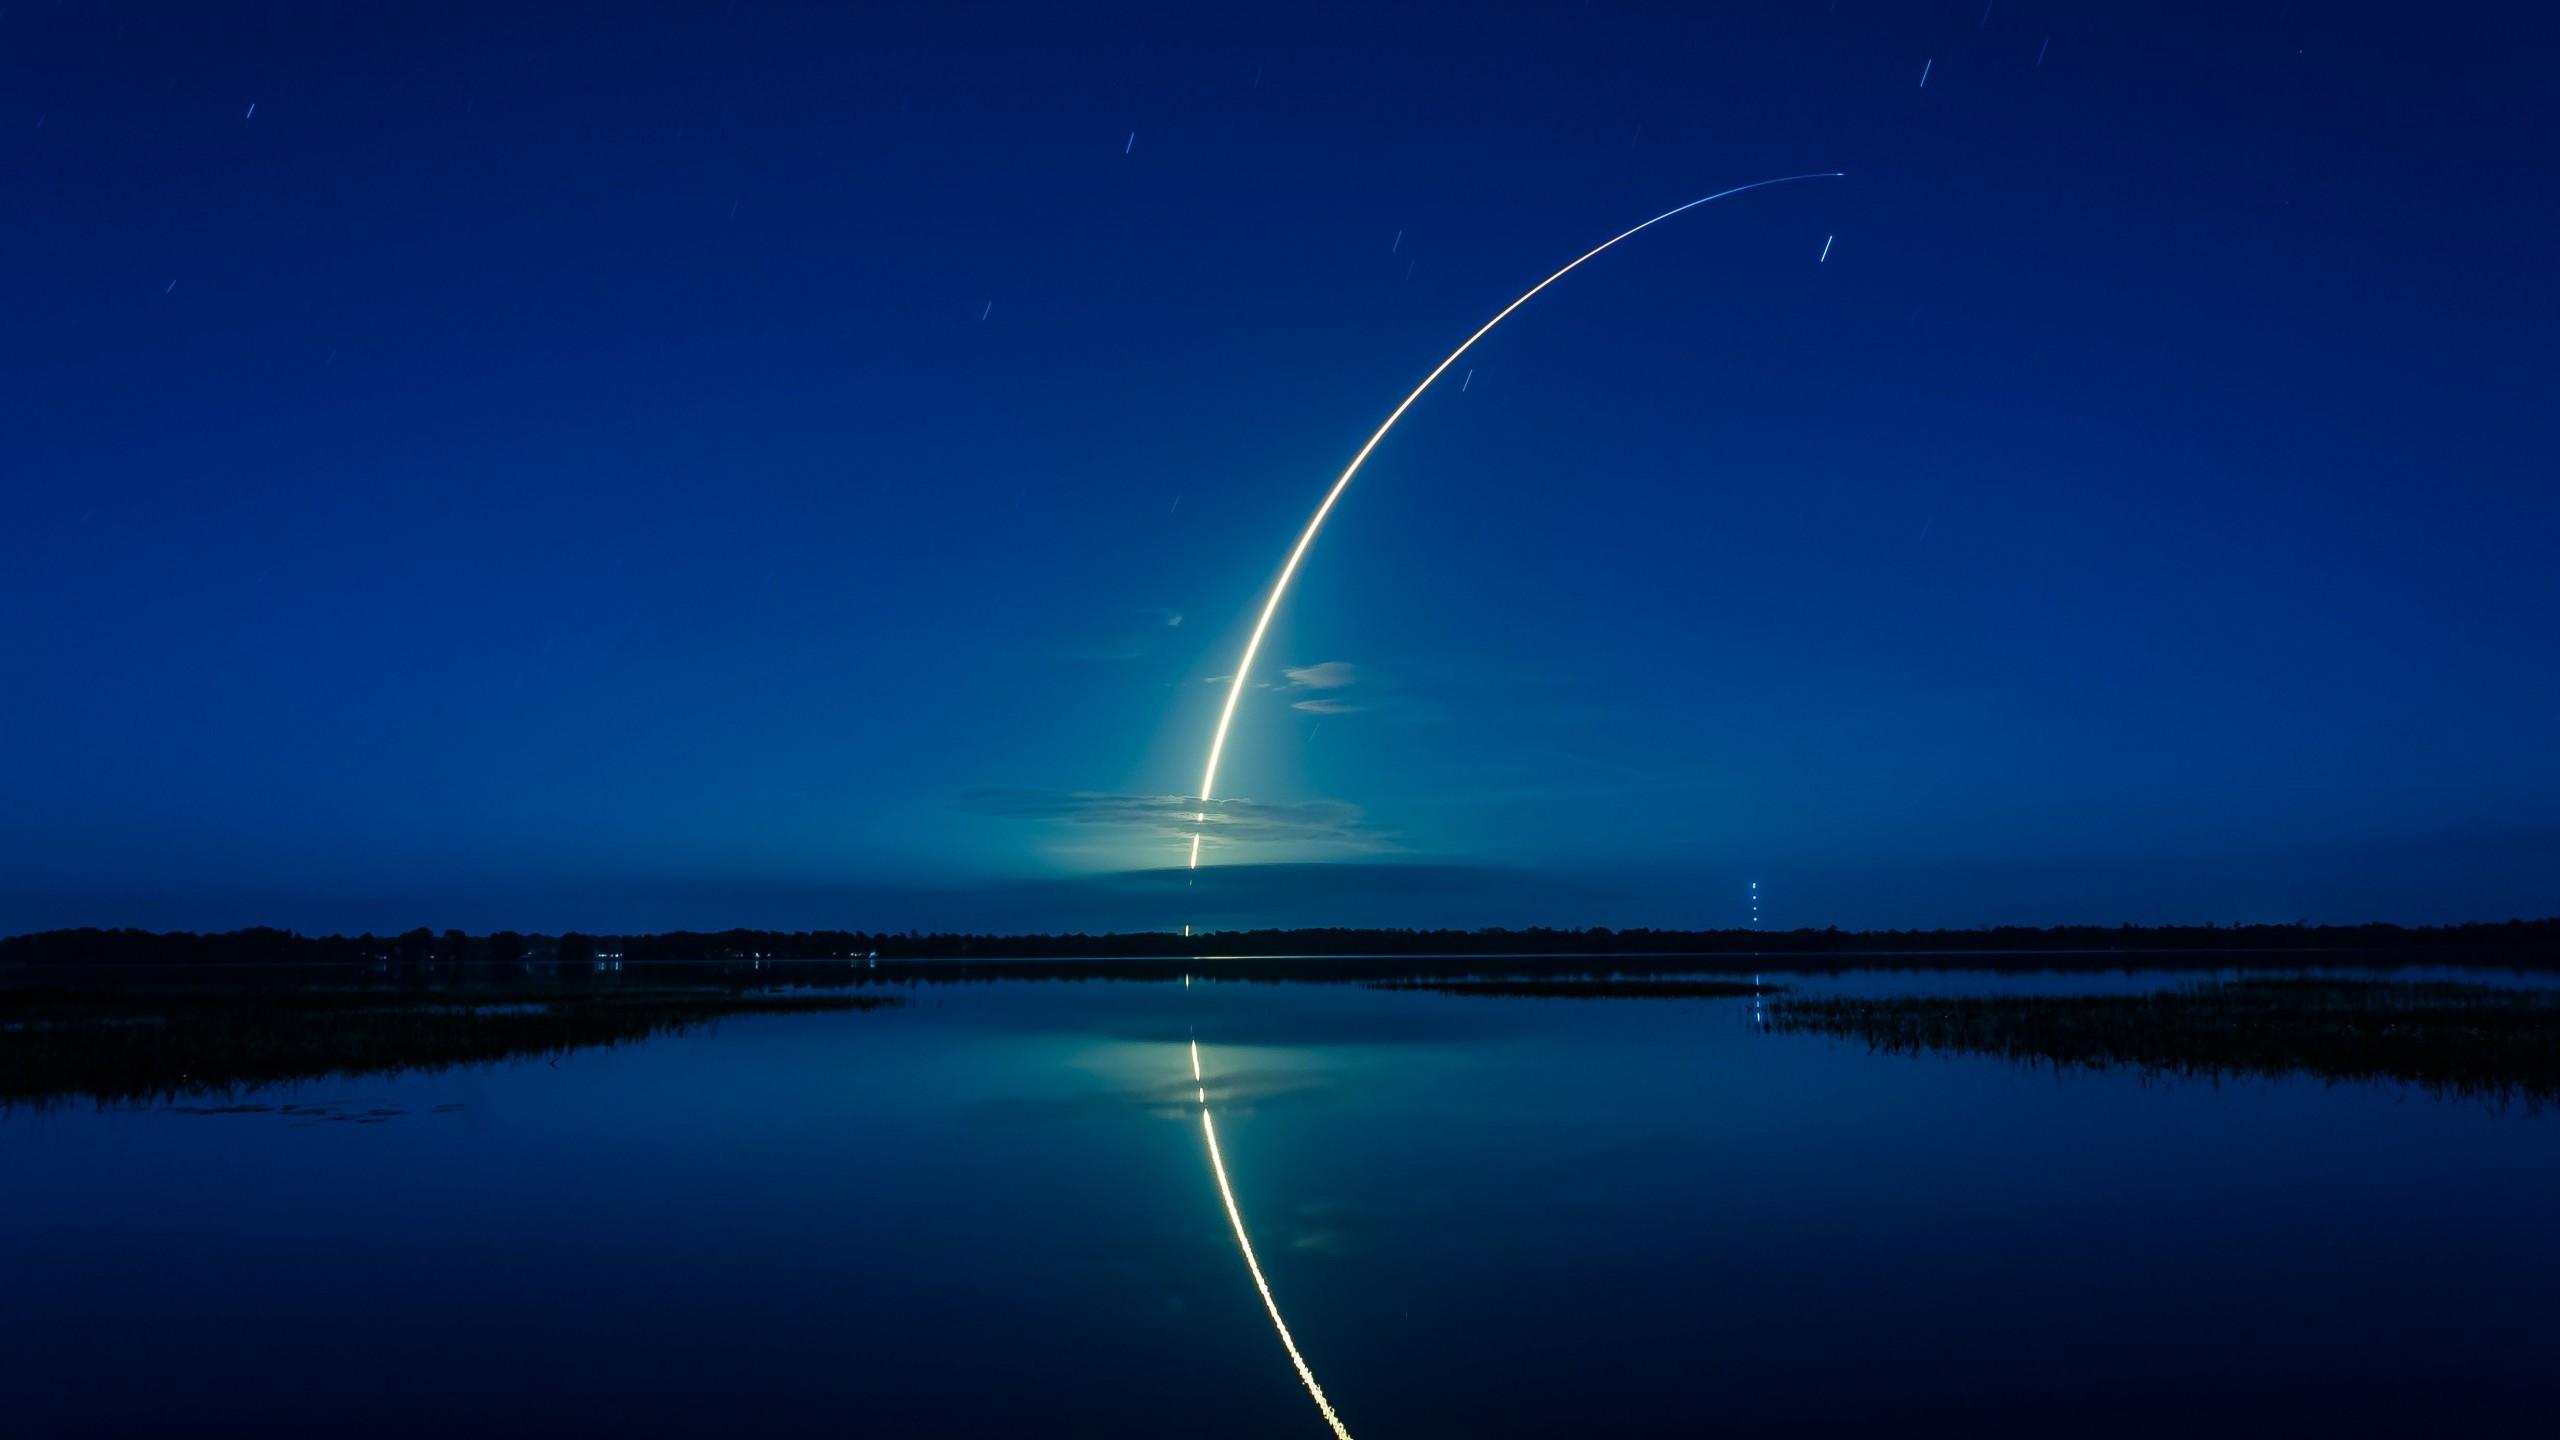 Space / Falcon 9 rocket Wallpaper